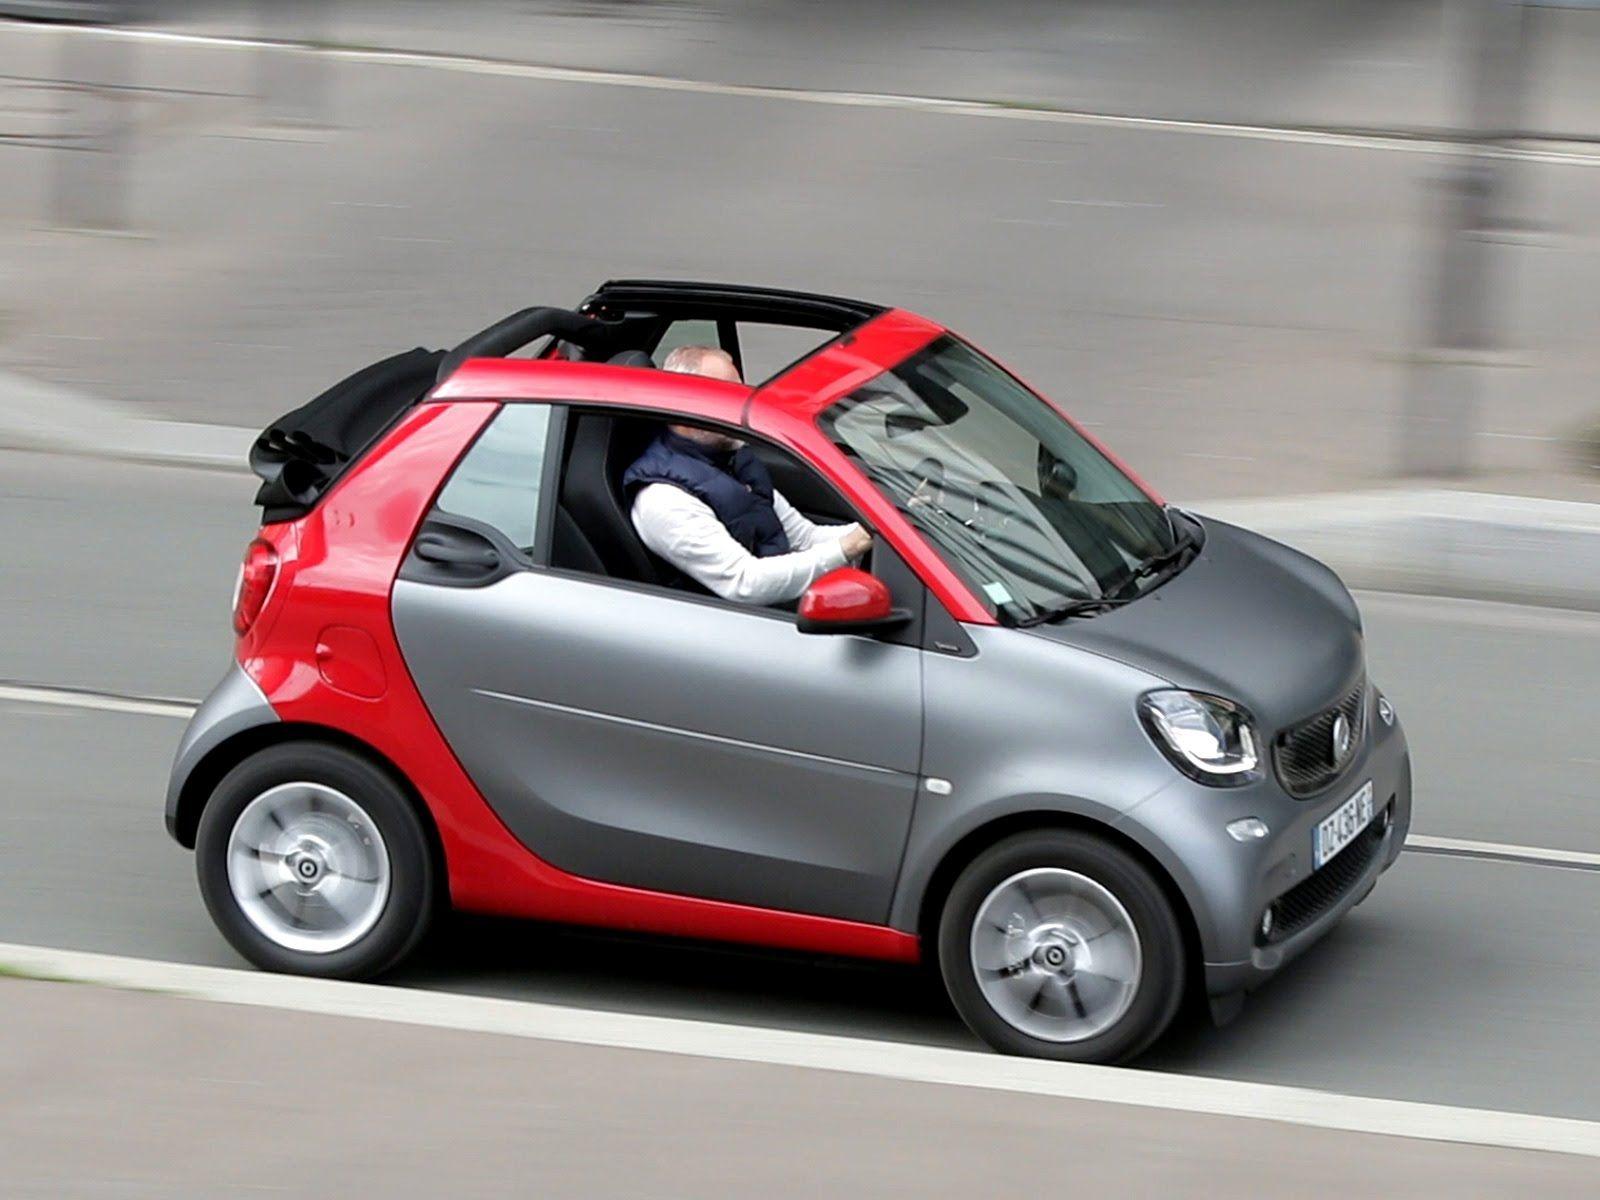 Essai Smart Fortwo Cabriolet 1 0 71 BVA Passion 2016